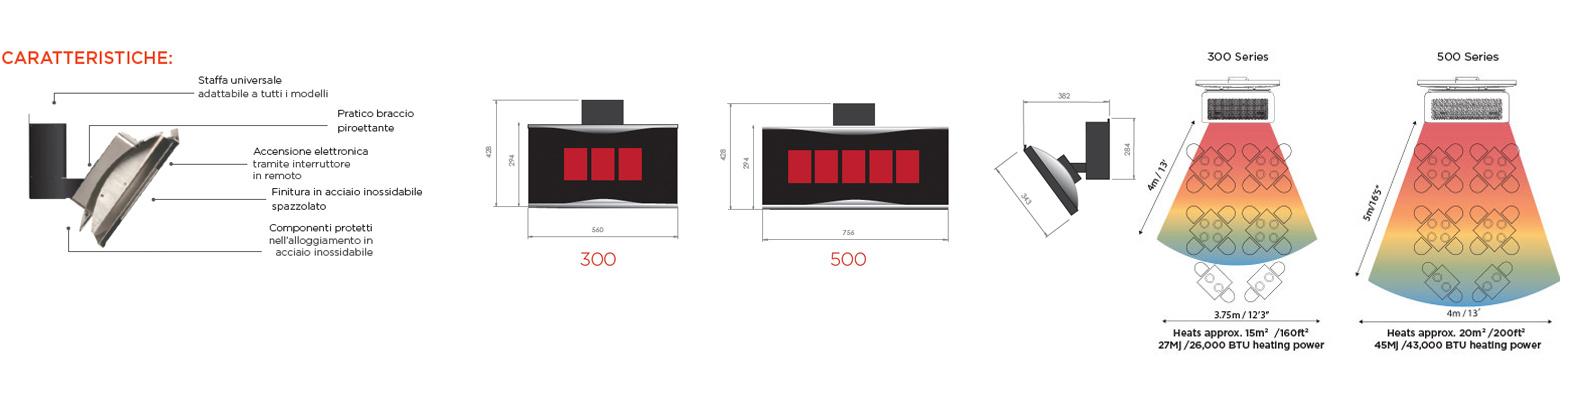 Vendita riscaldatori gas esterno per dehor verande bar - Riscaldatori per esterno a gas ...